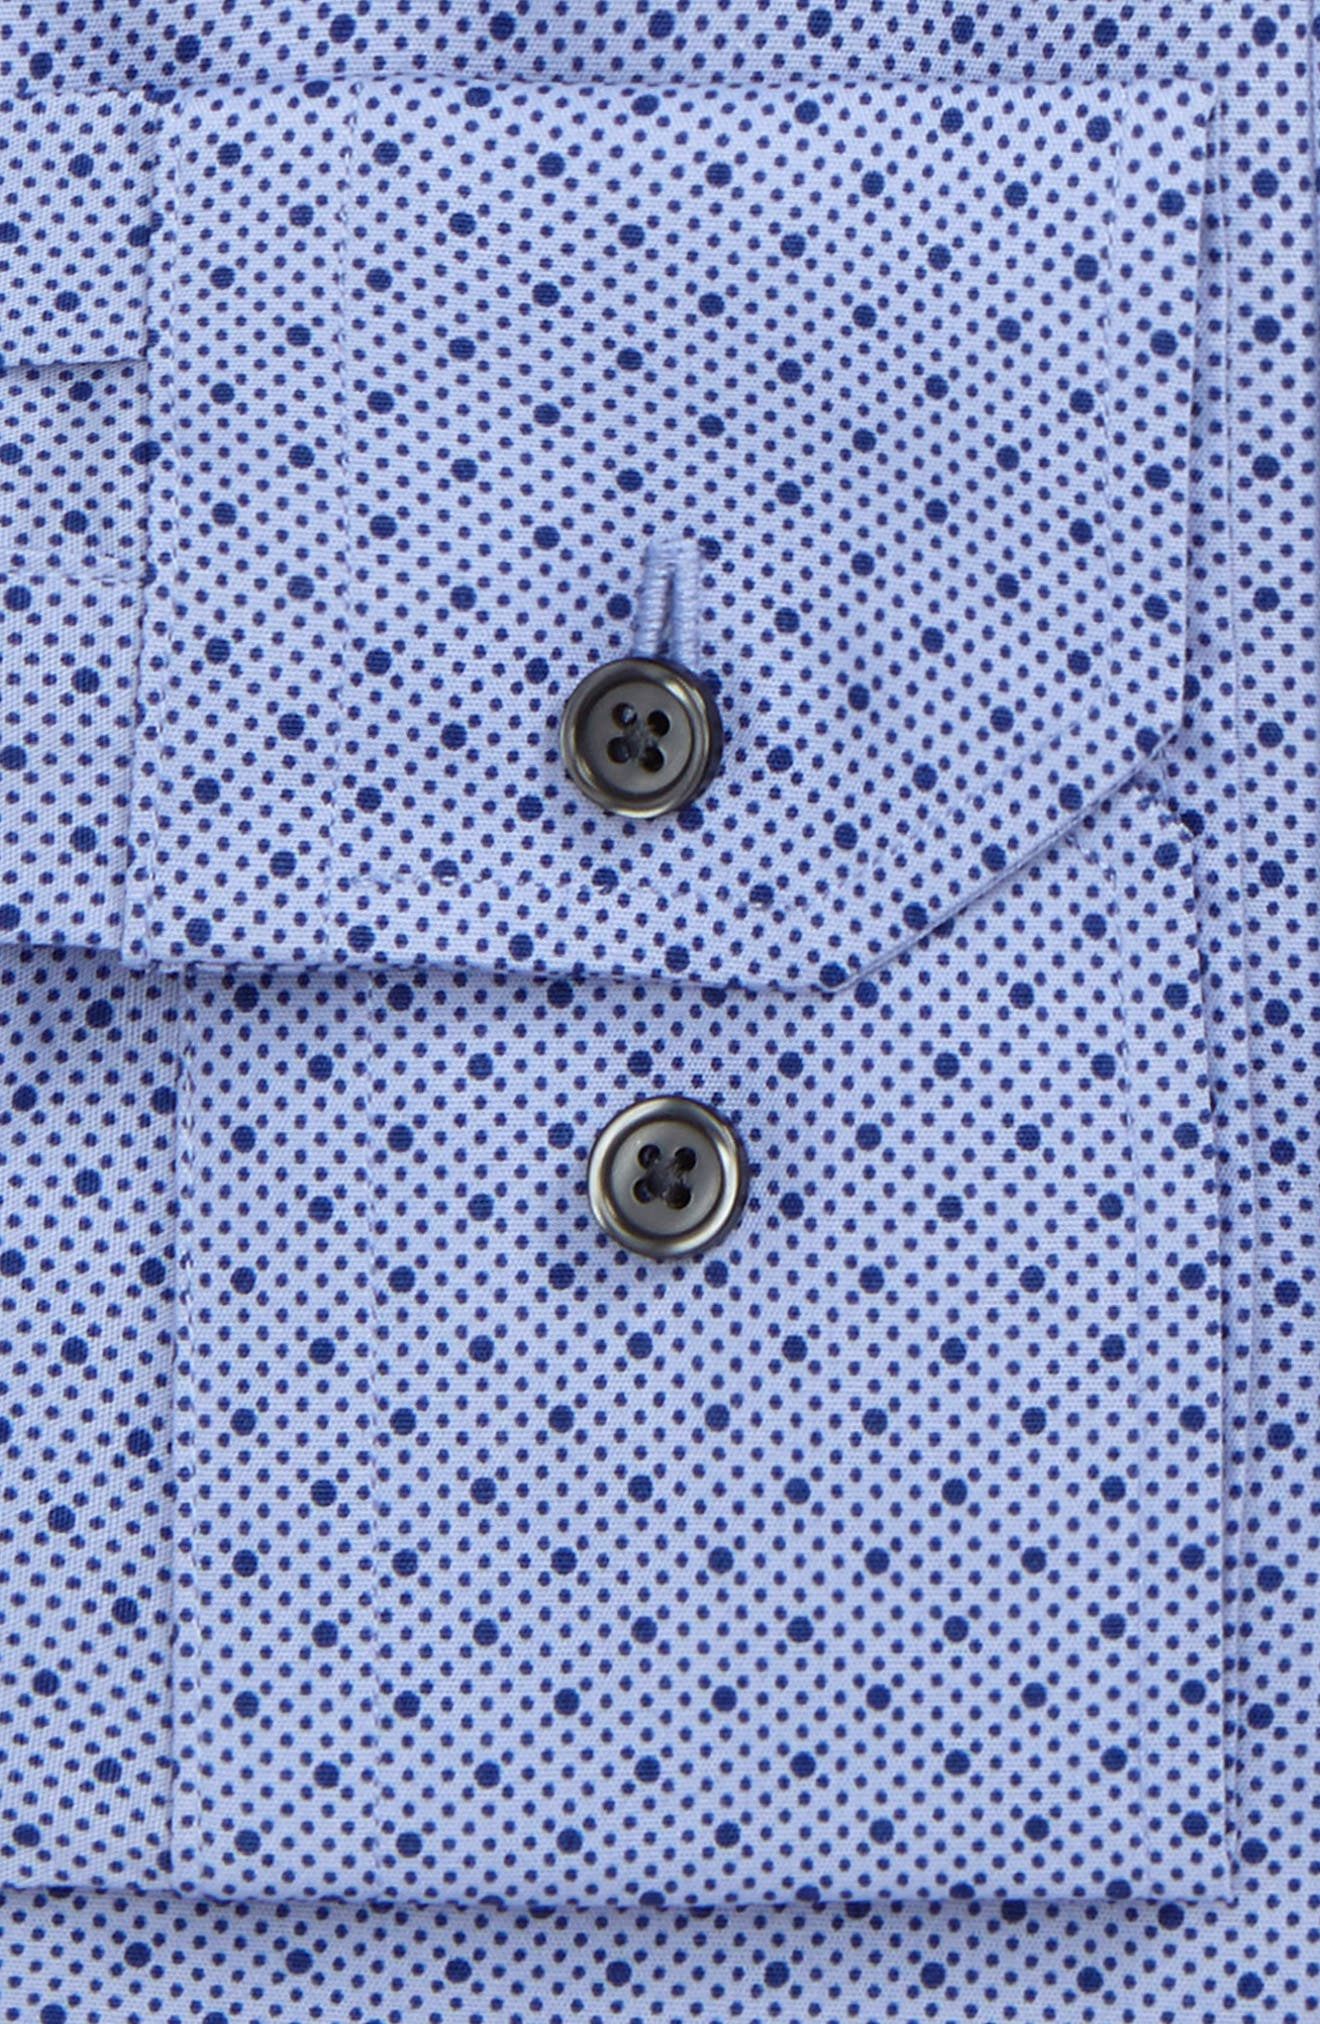 Trim Fit Stretch Dot Dress Shirt,                             Alternate thumbnail 2, color,                             Blue Clematis